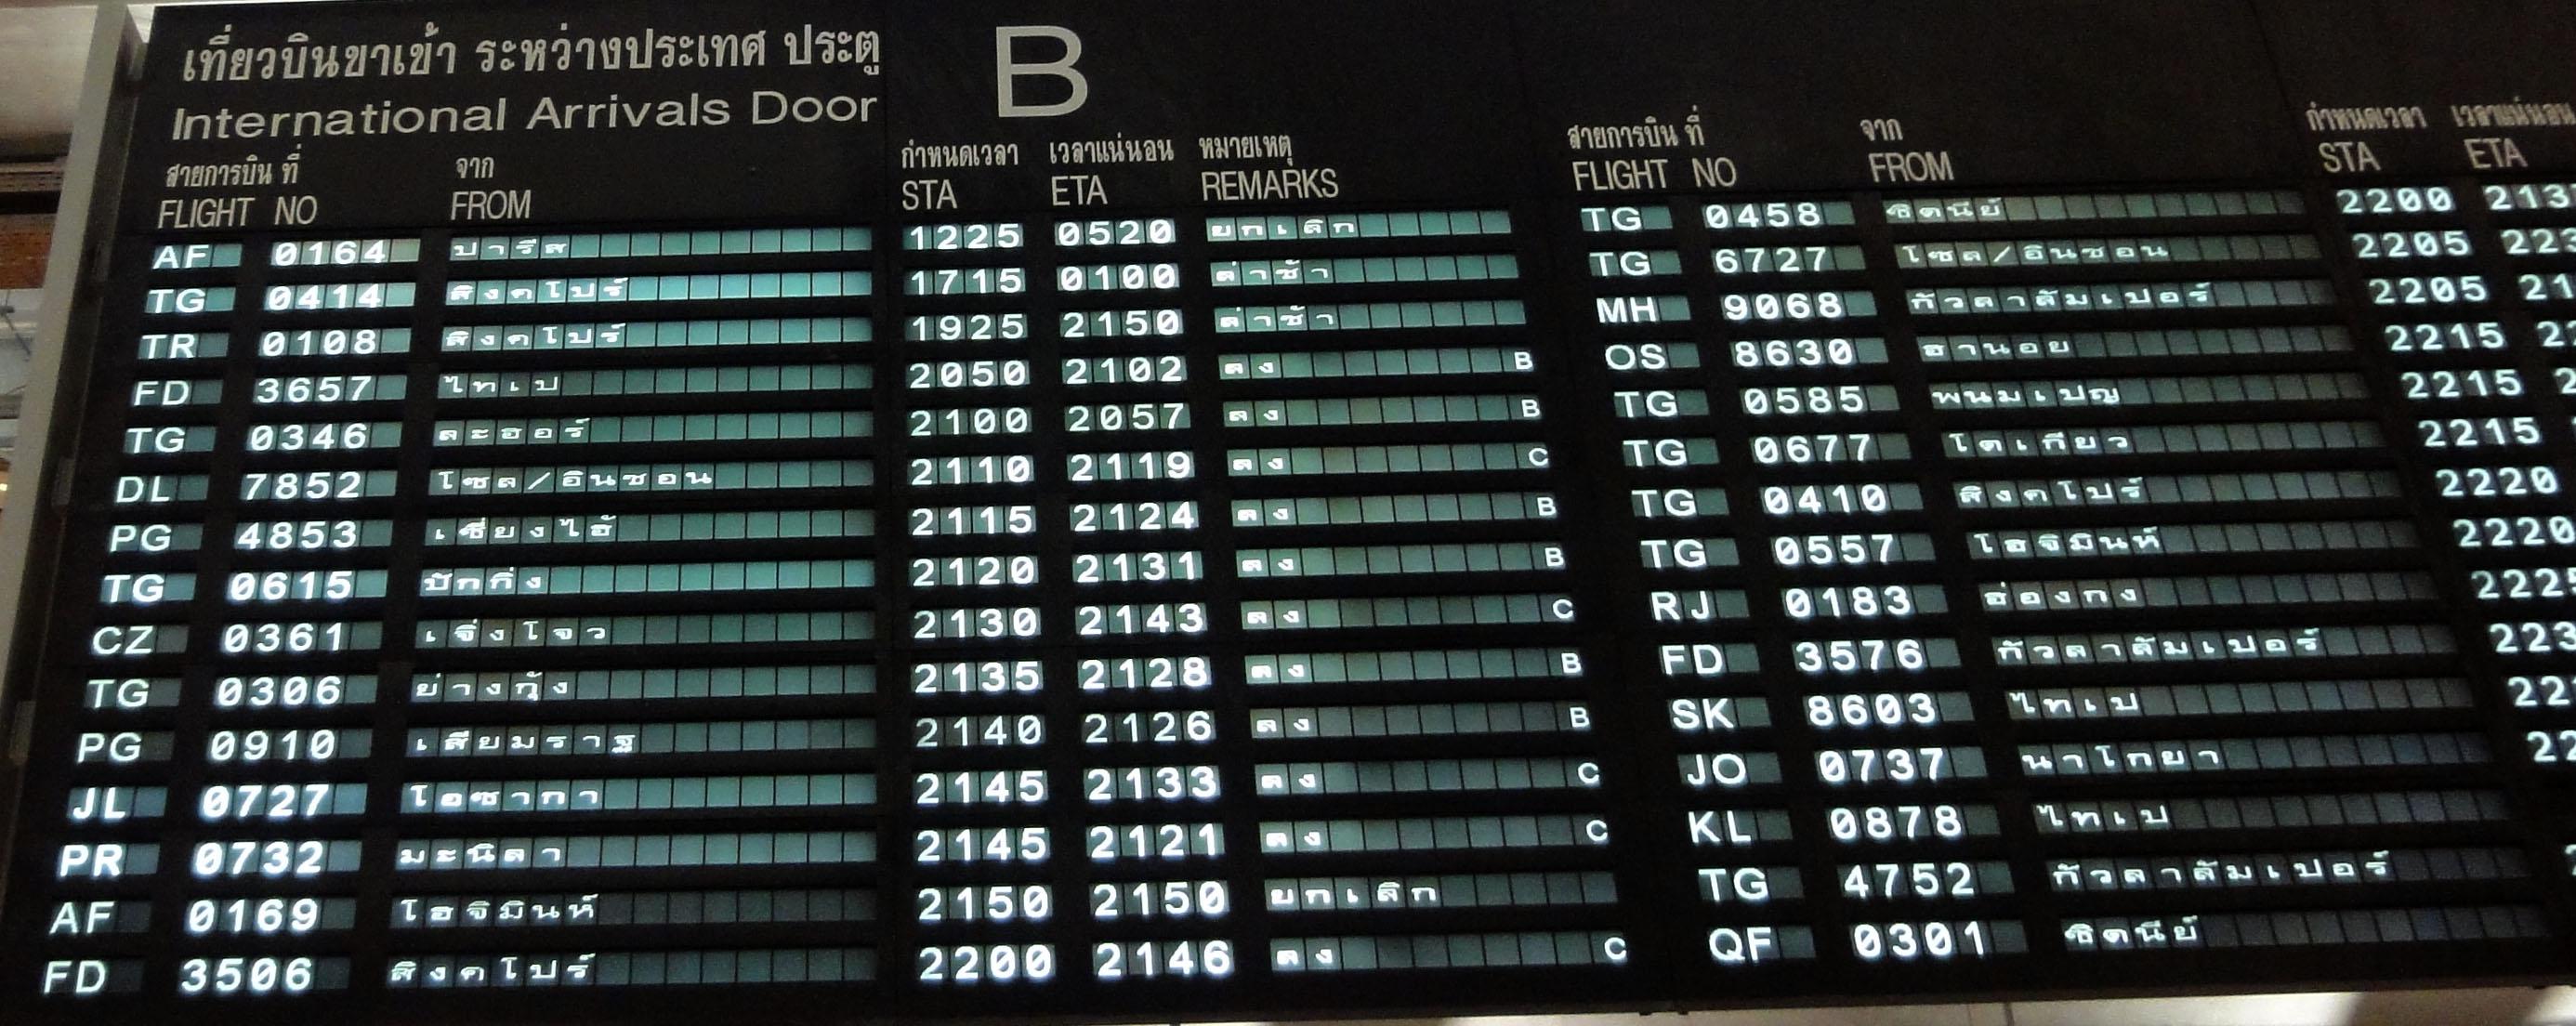 Flight Arival and Departure boards Suvarnabhumi Airport Thailand 2009 05